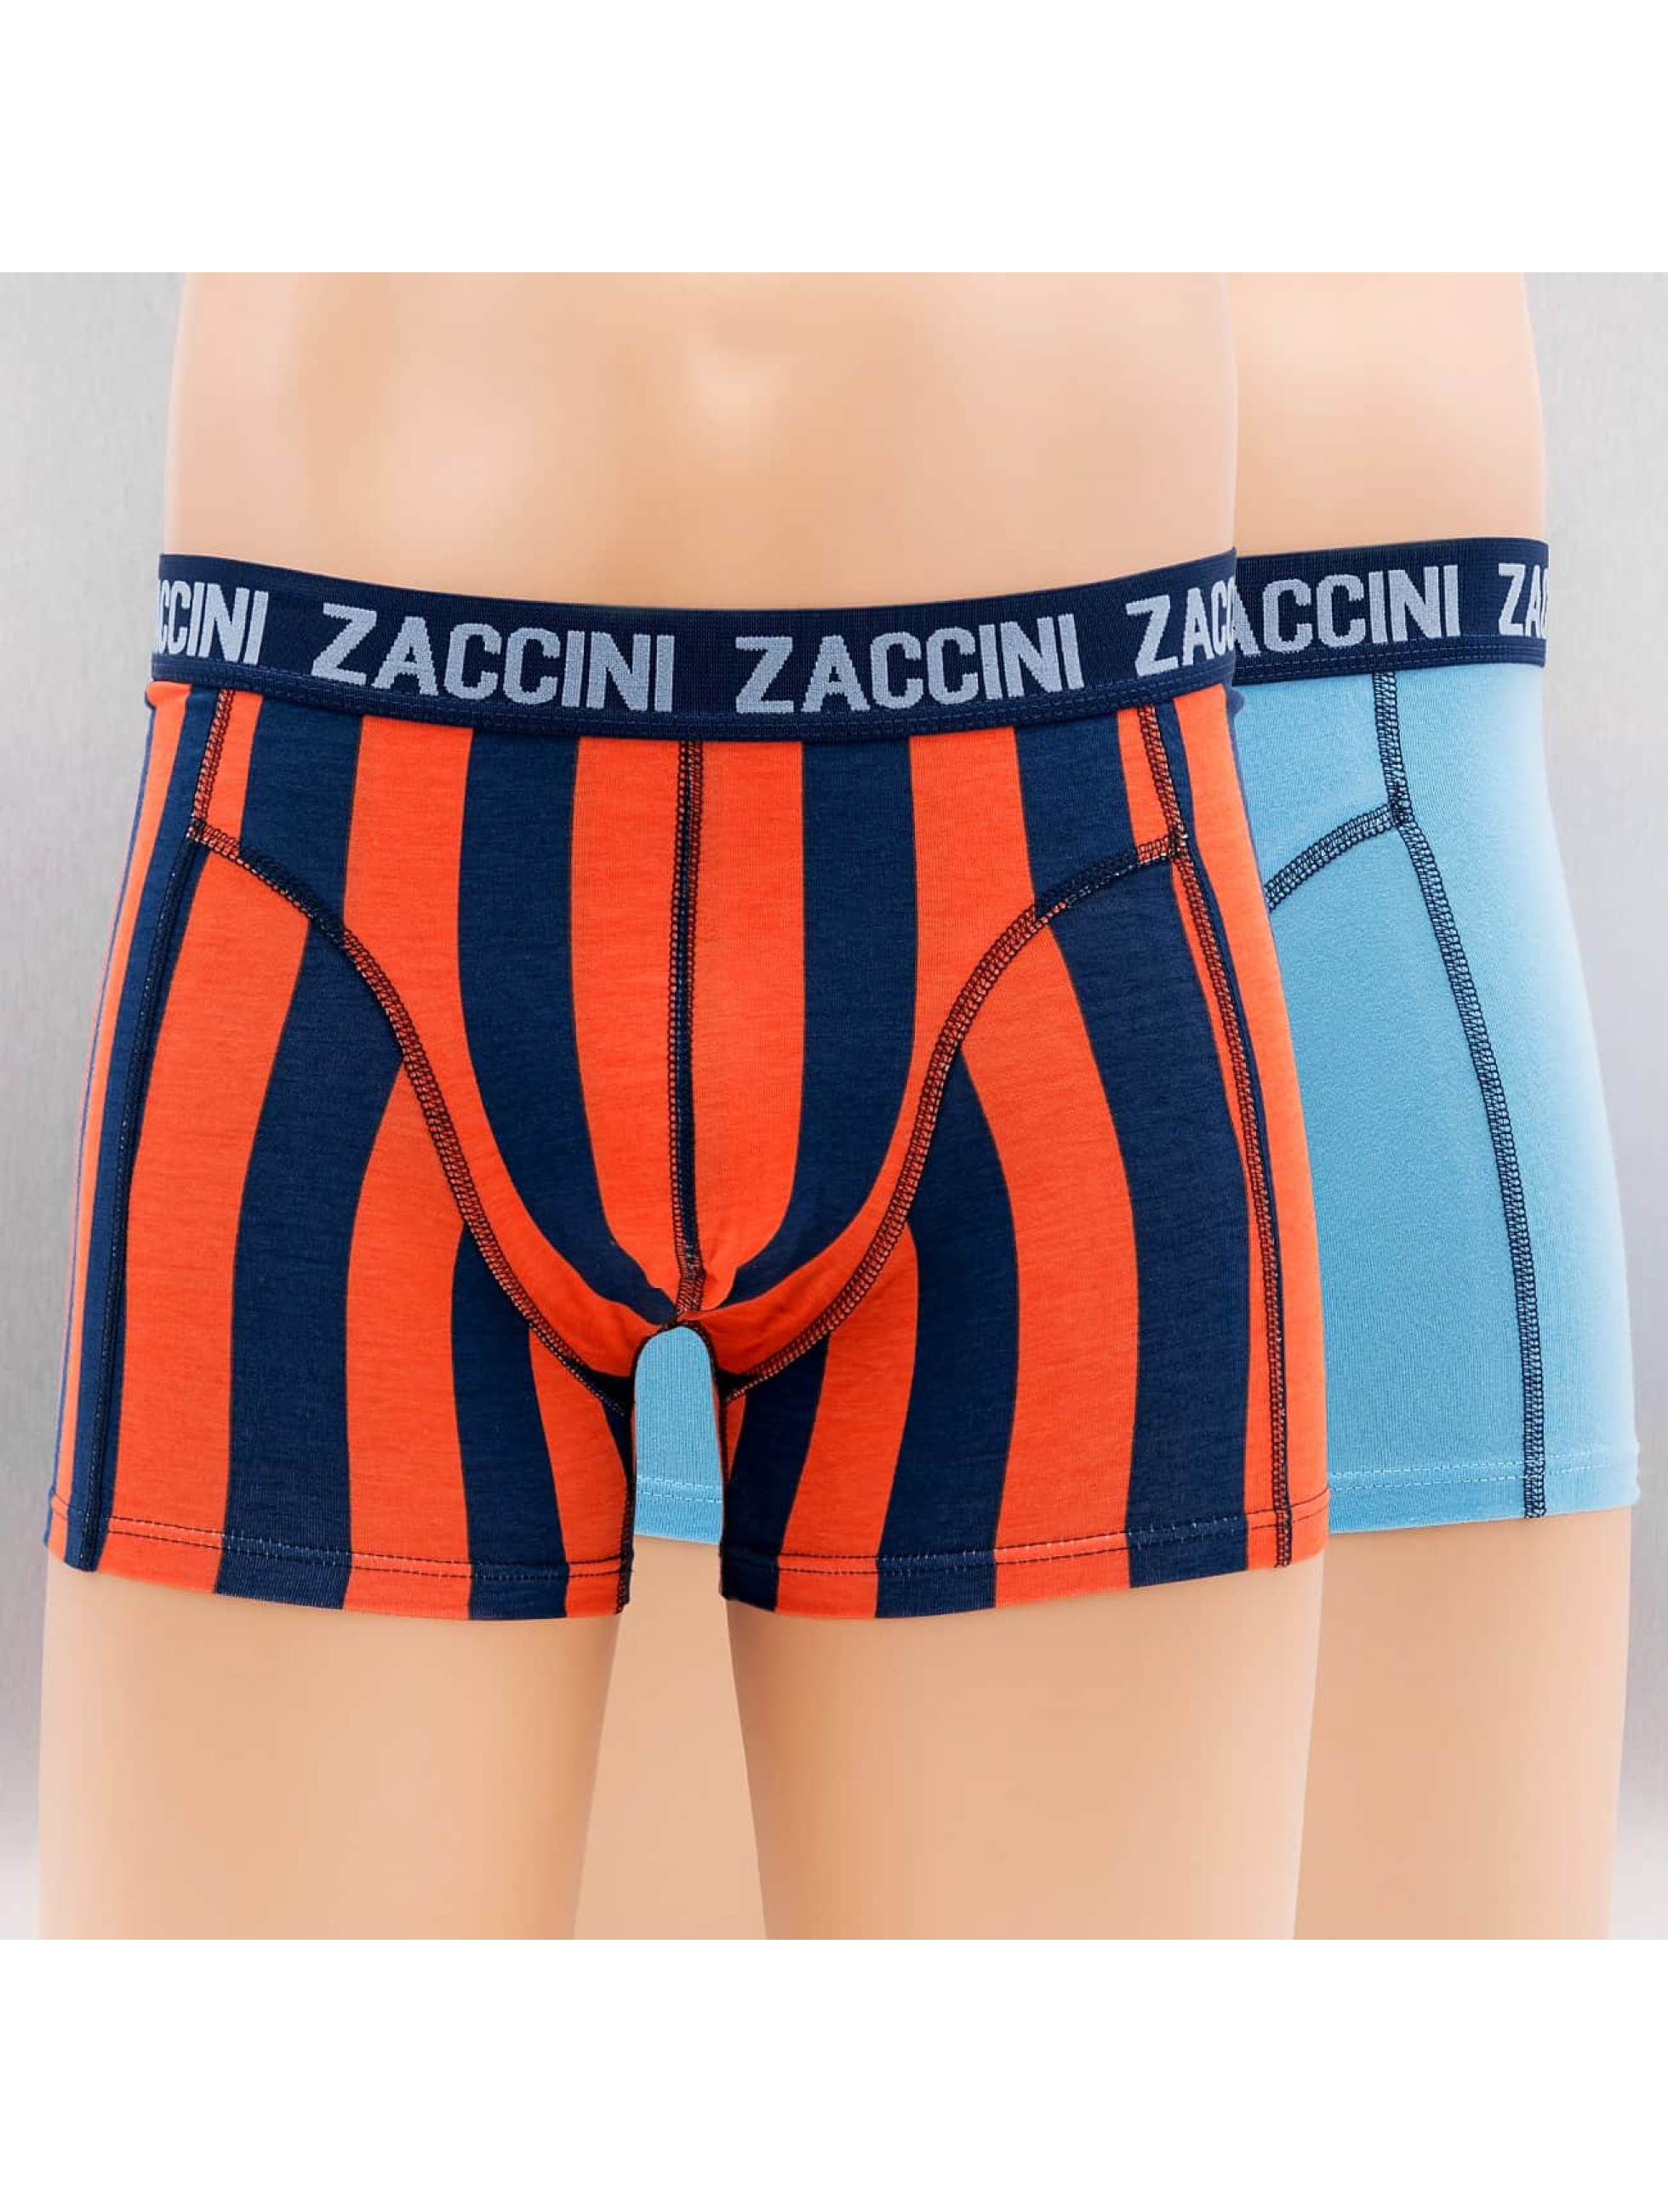 Zaccini Boxer Short Marrakesh 2-Pack blue